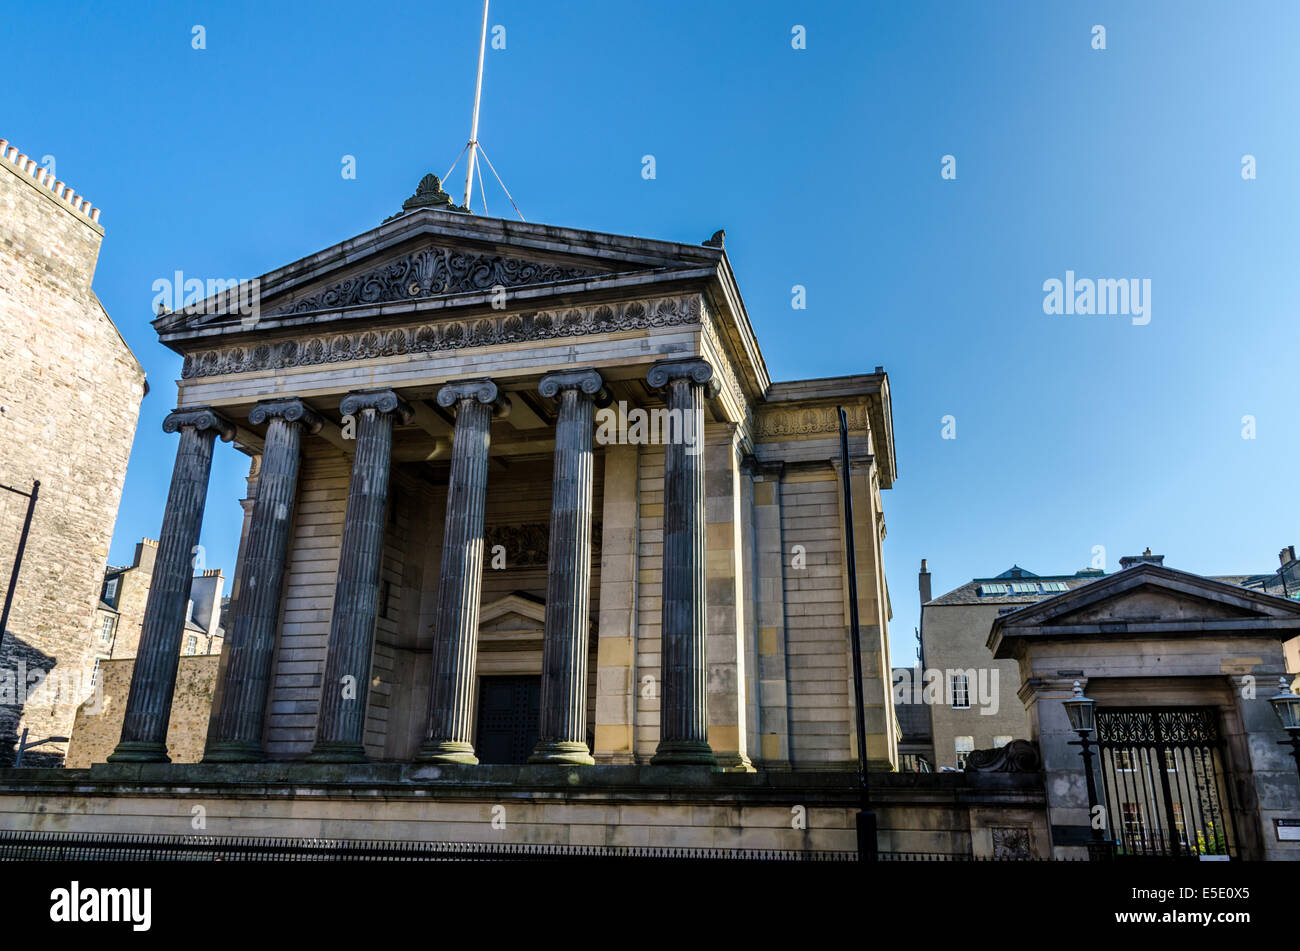 Surgeons' Hall in Edinburgh, Scotland, is the headquarters of the Royal College of Surgeons of Edinburgh (RCSED). - Stock Image